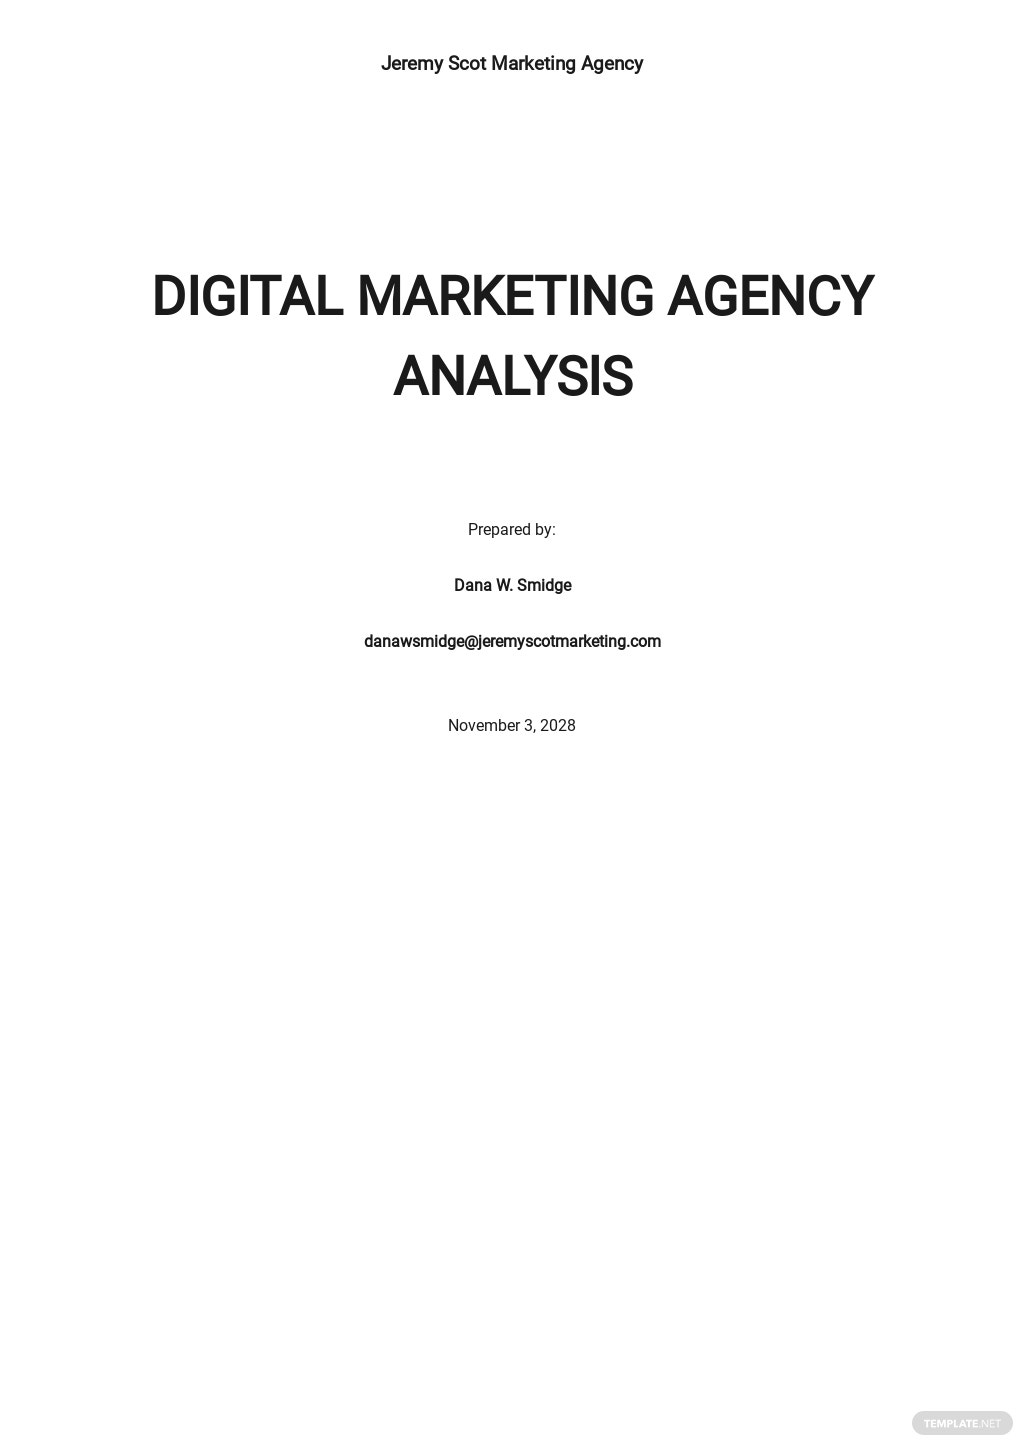 Digital marketing agency swot analysis template.jpe